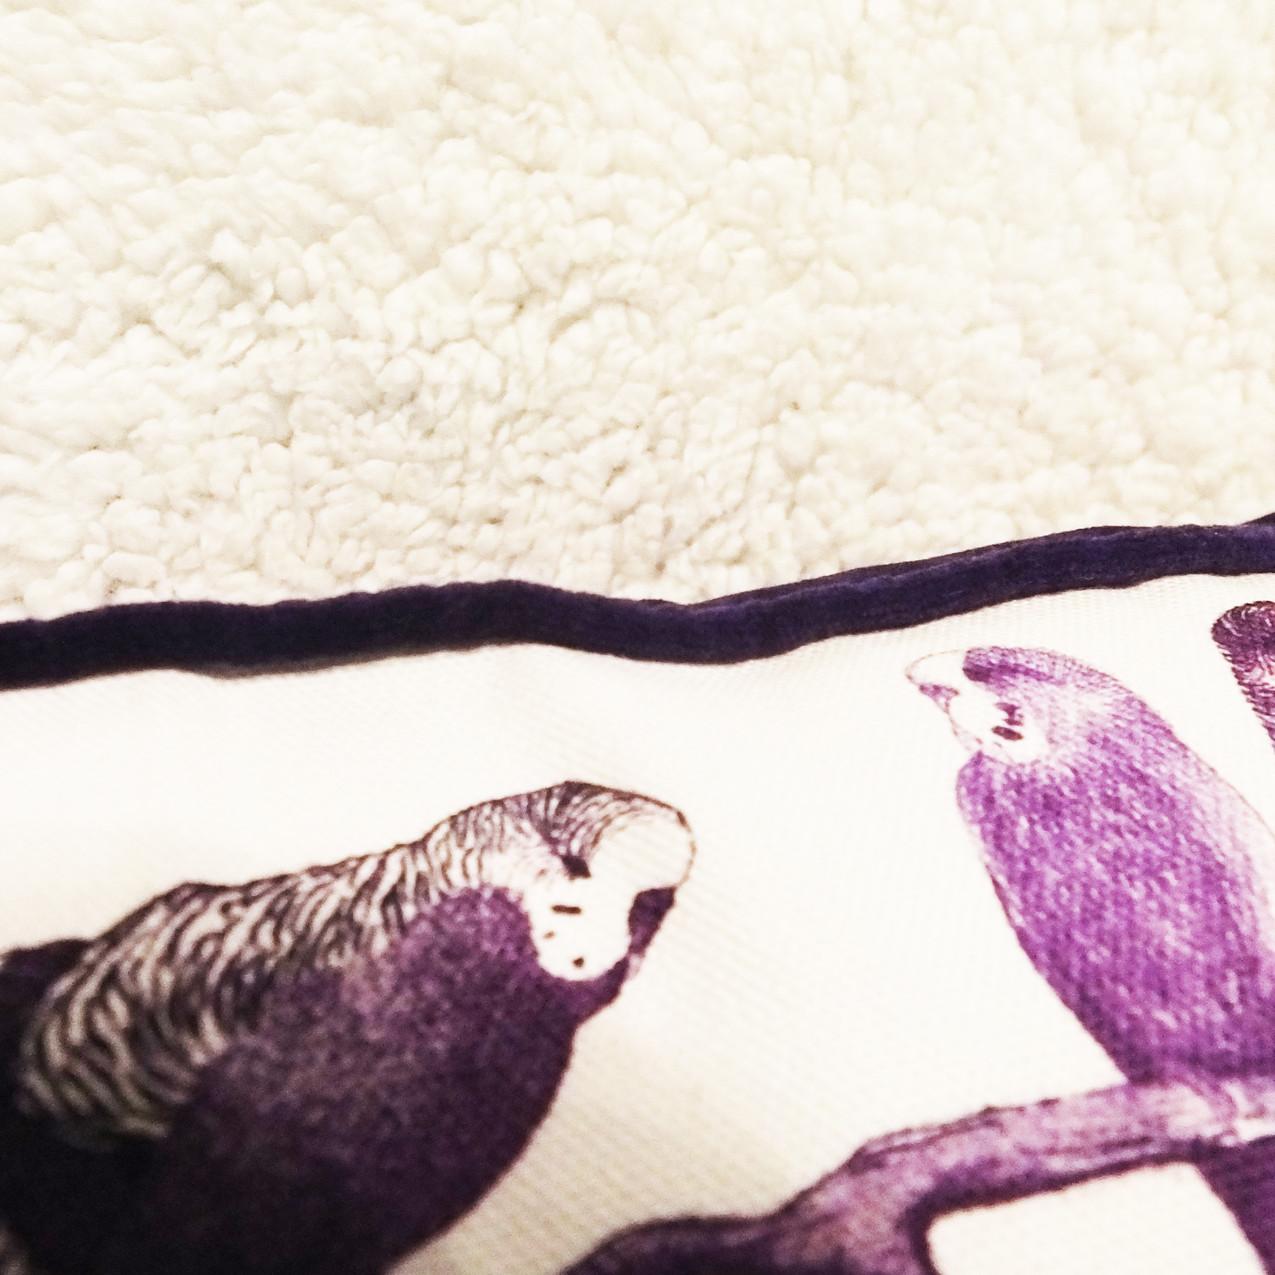 Jenny K Home Aviary Group Budgie Bird Cushion Purple Velvet Piping Cotton 3